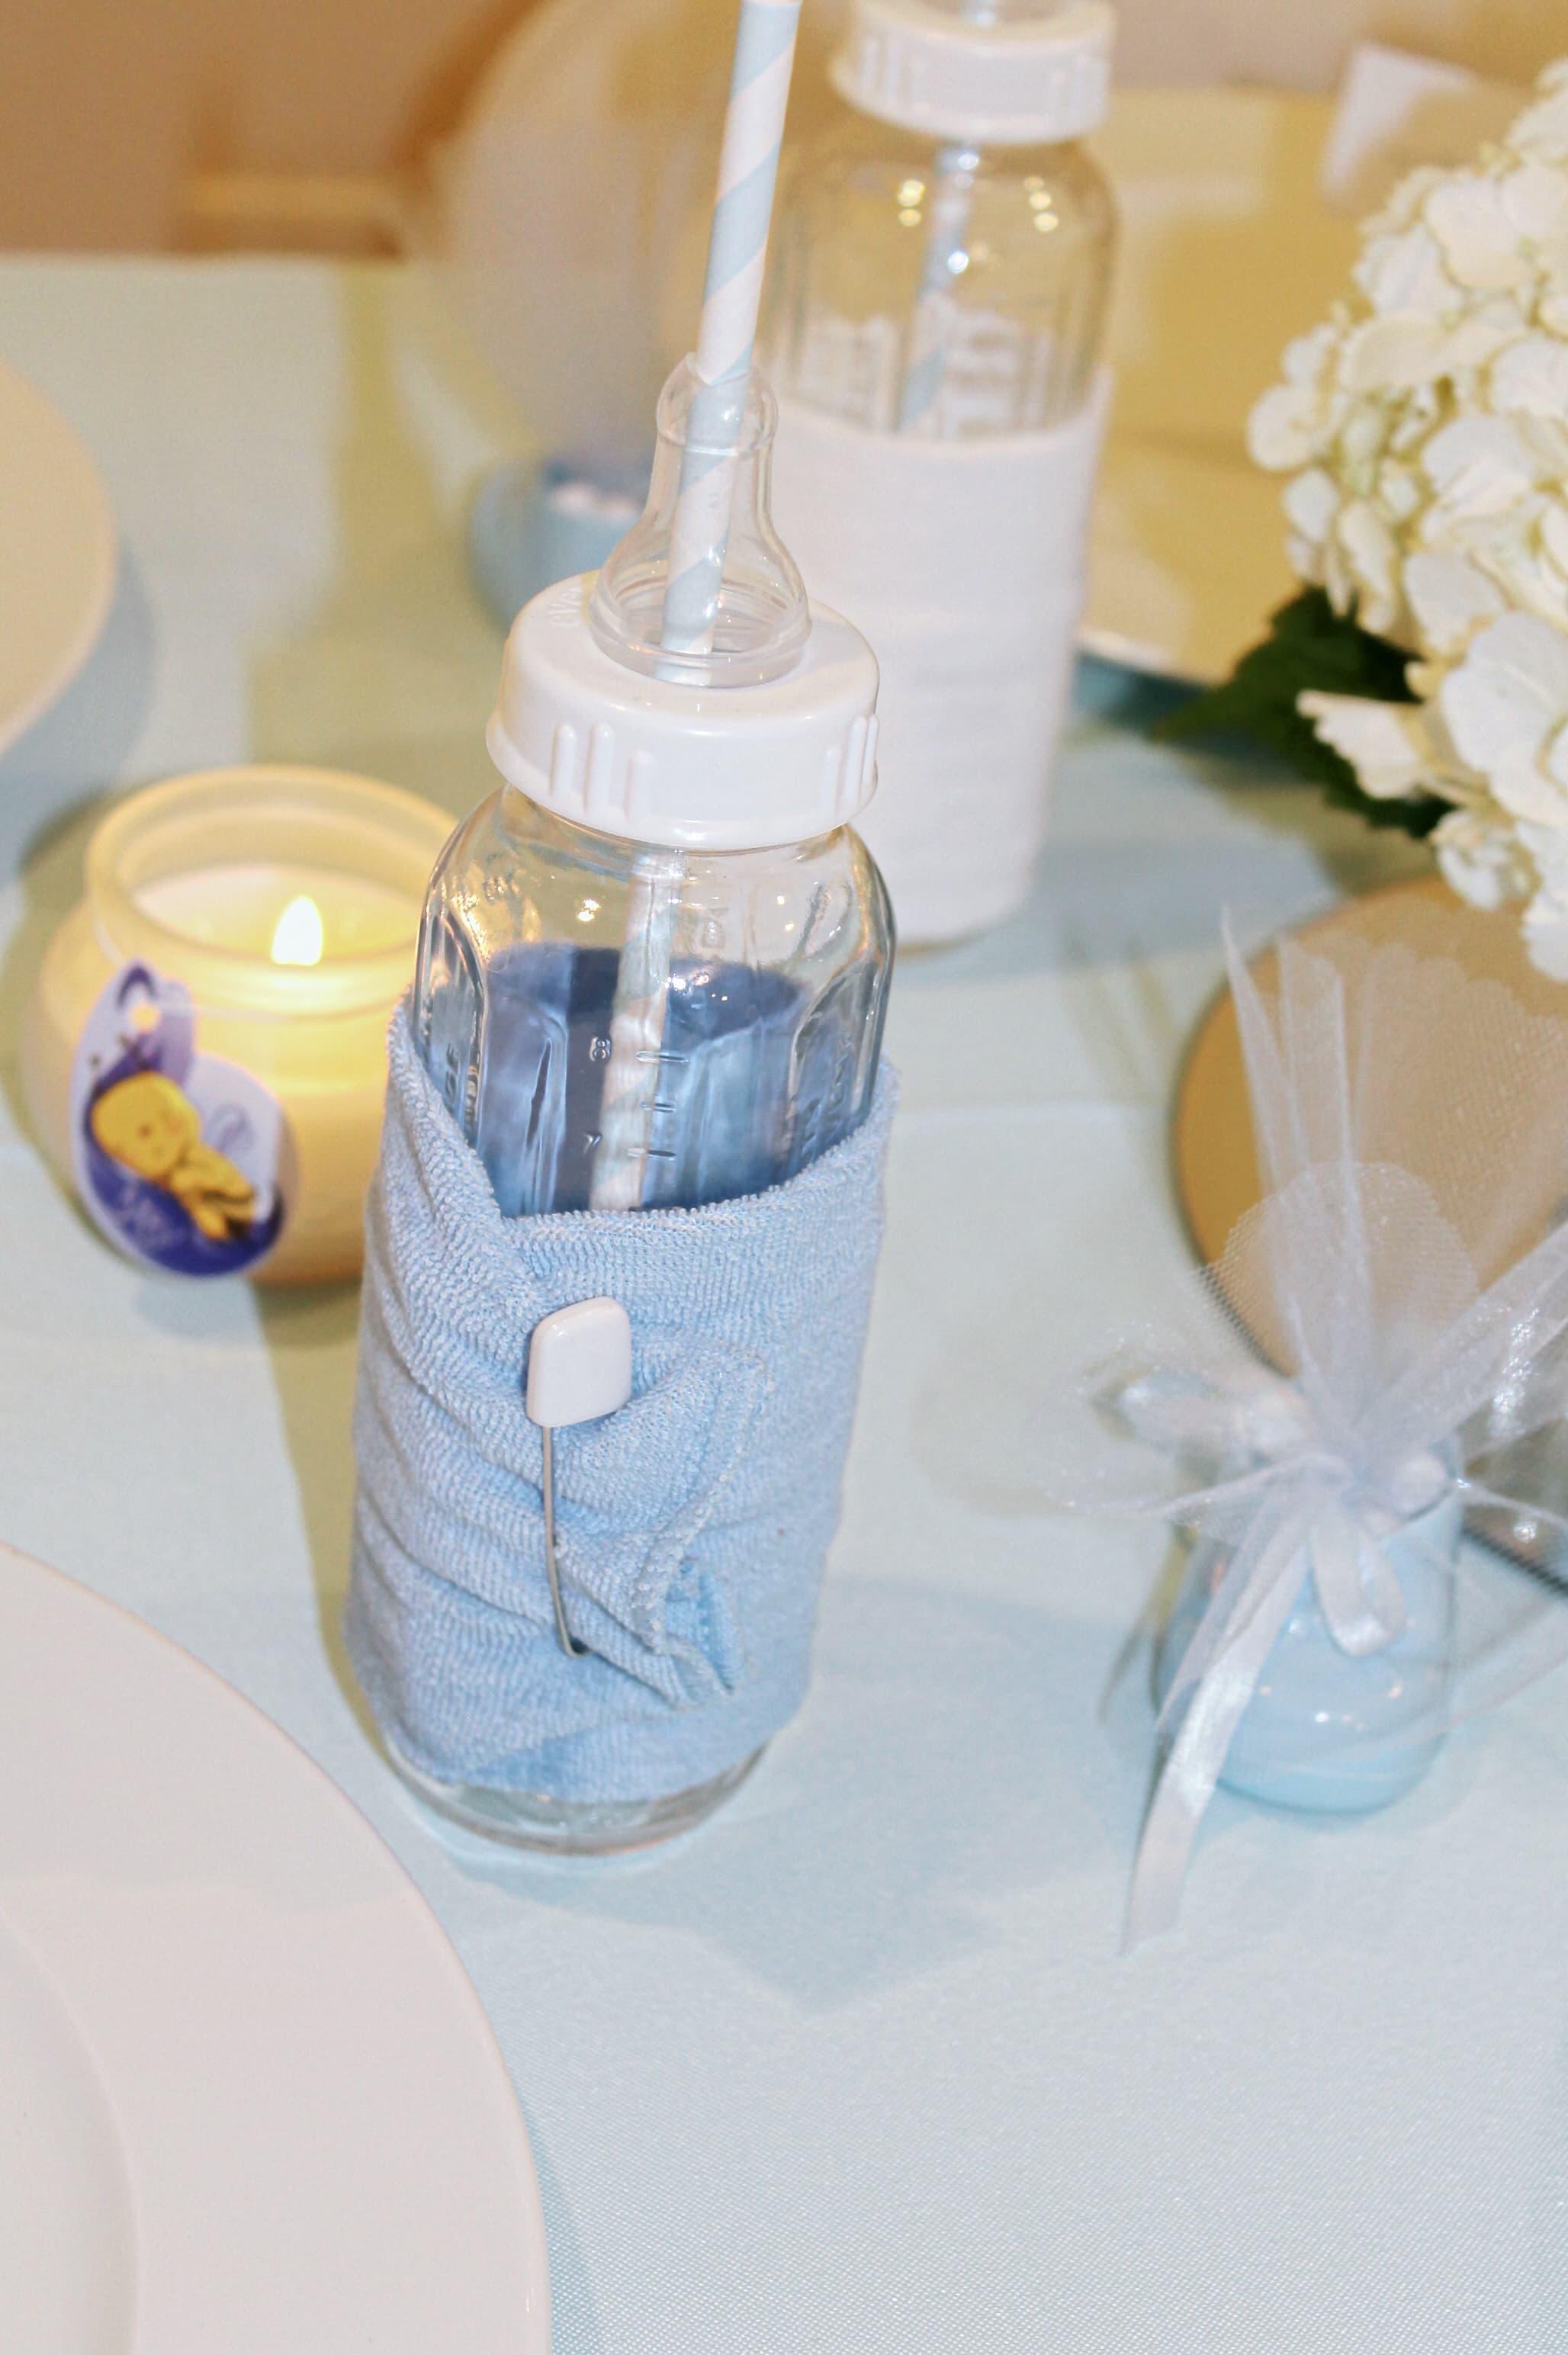 IMG 2451 - Teddy Bear Baby Shower Decoration